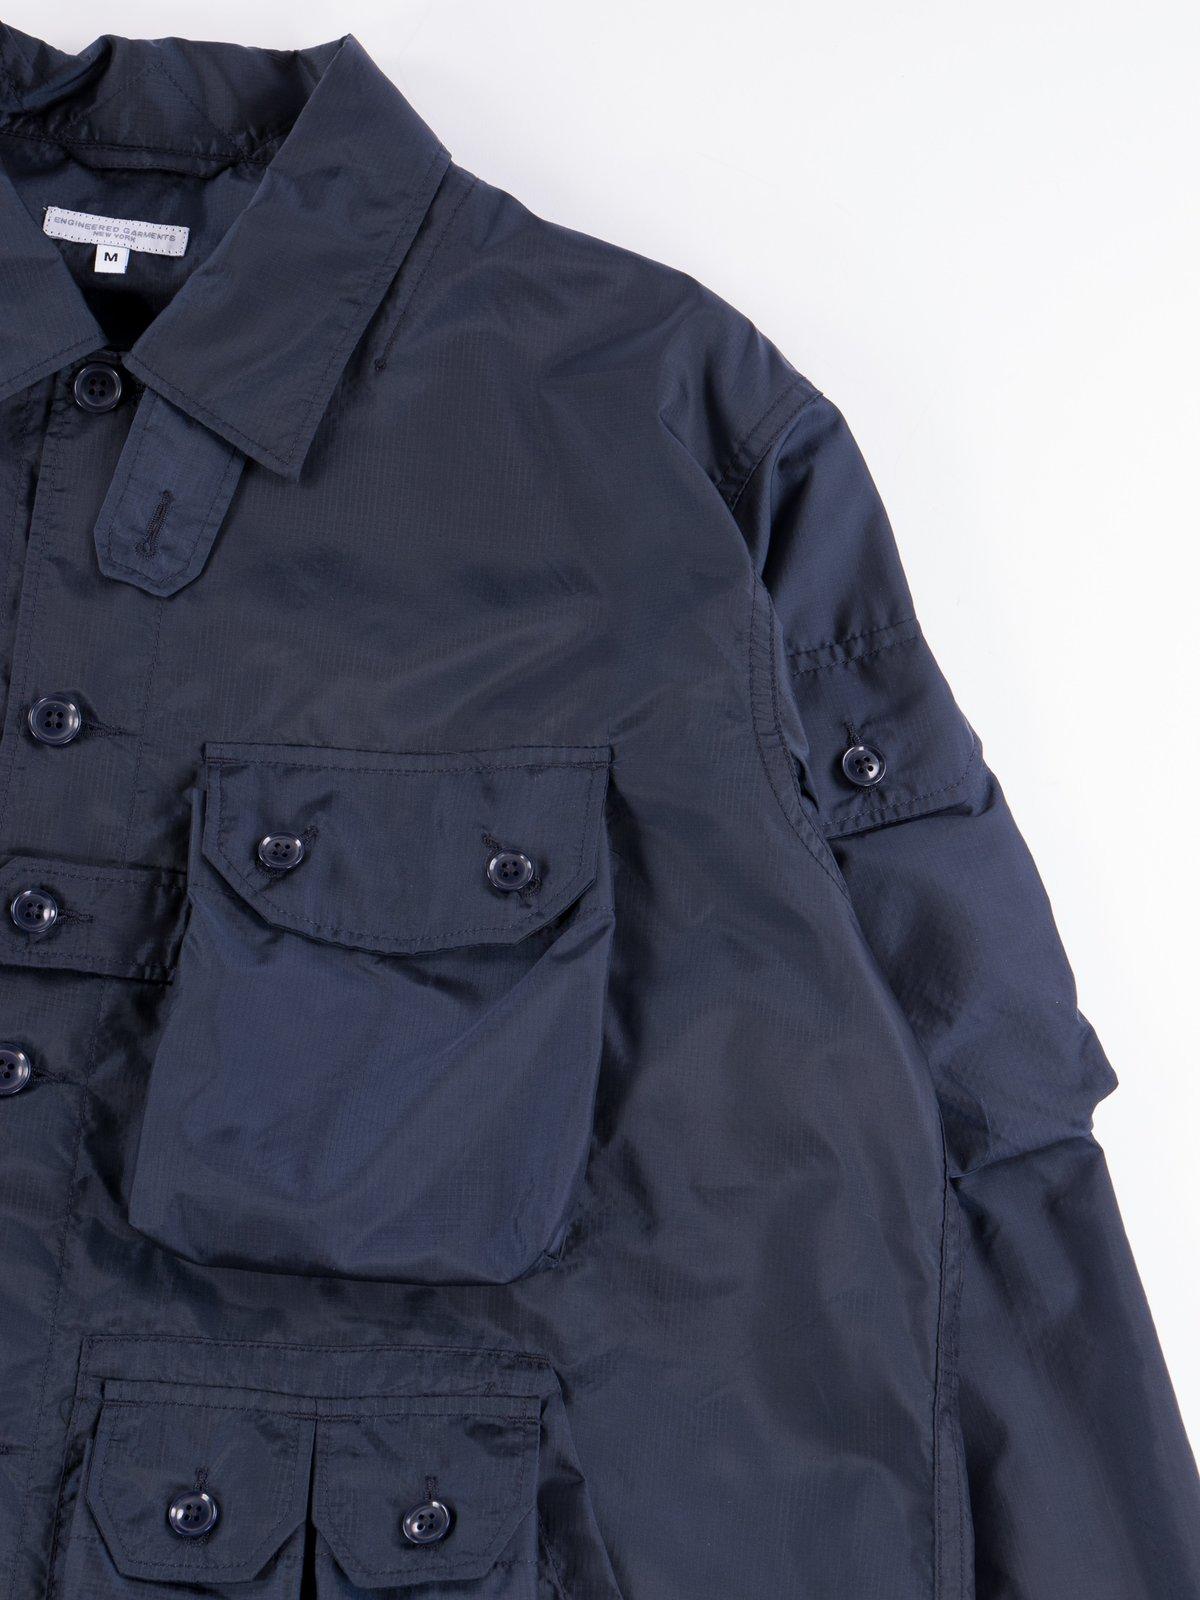 Navy Nylon Micro Ripstop Explorer Shirt Jacket  - Image 5